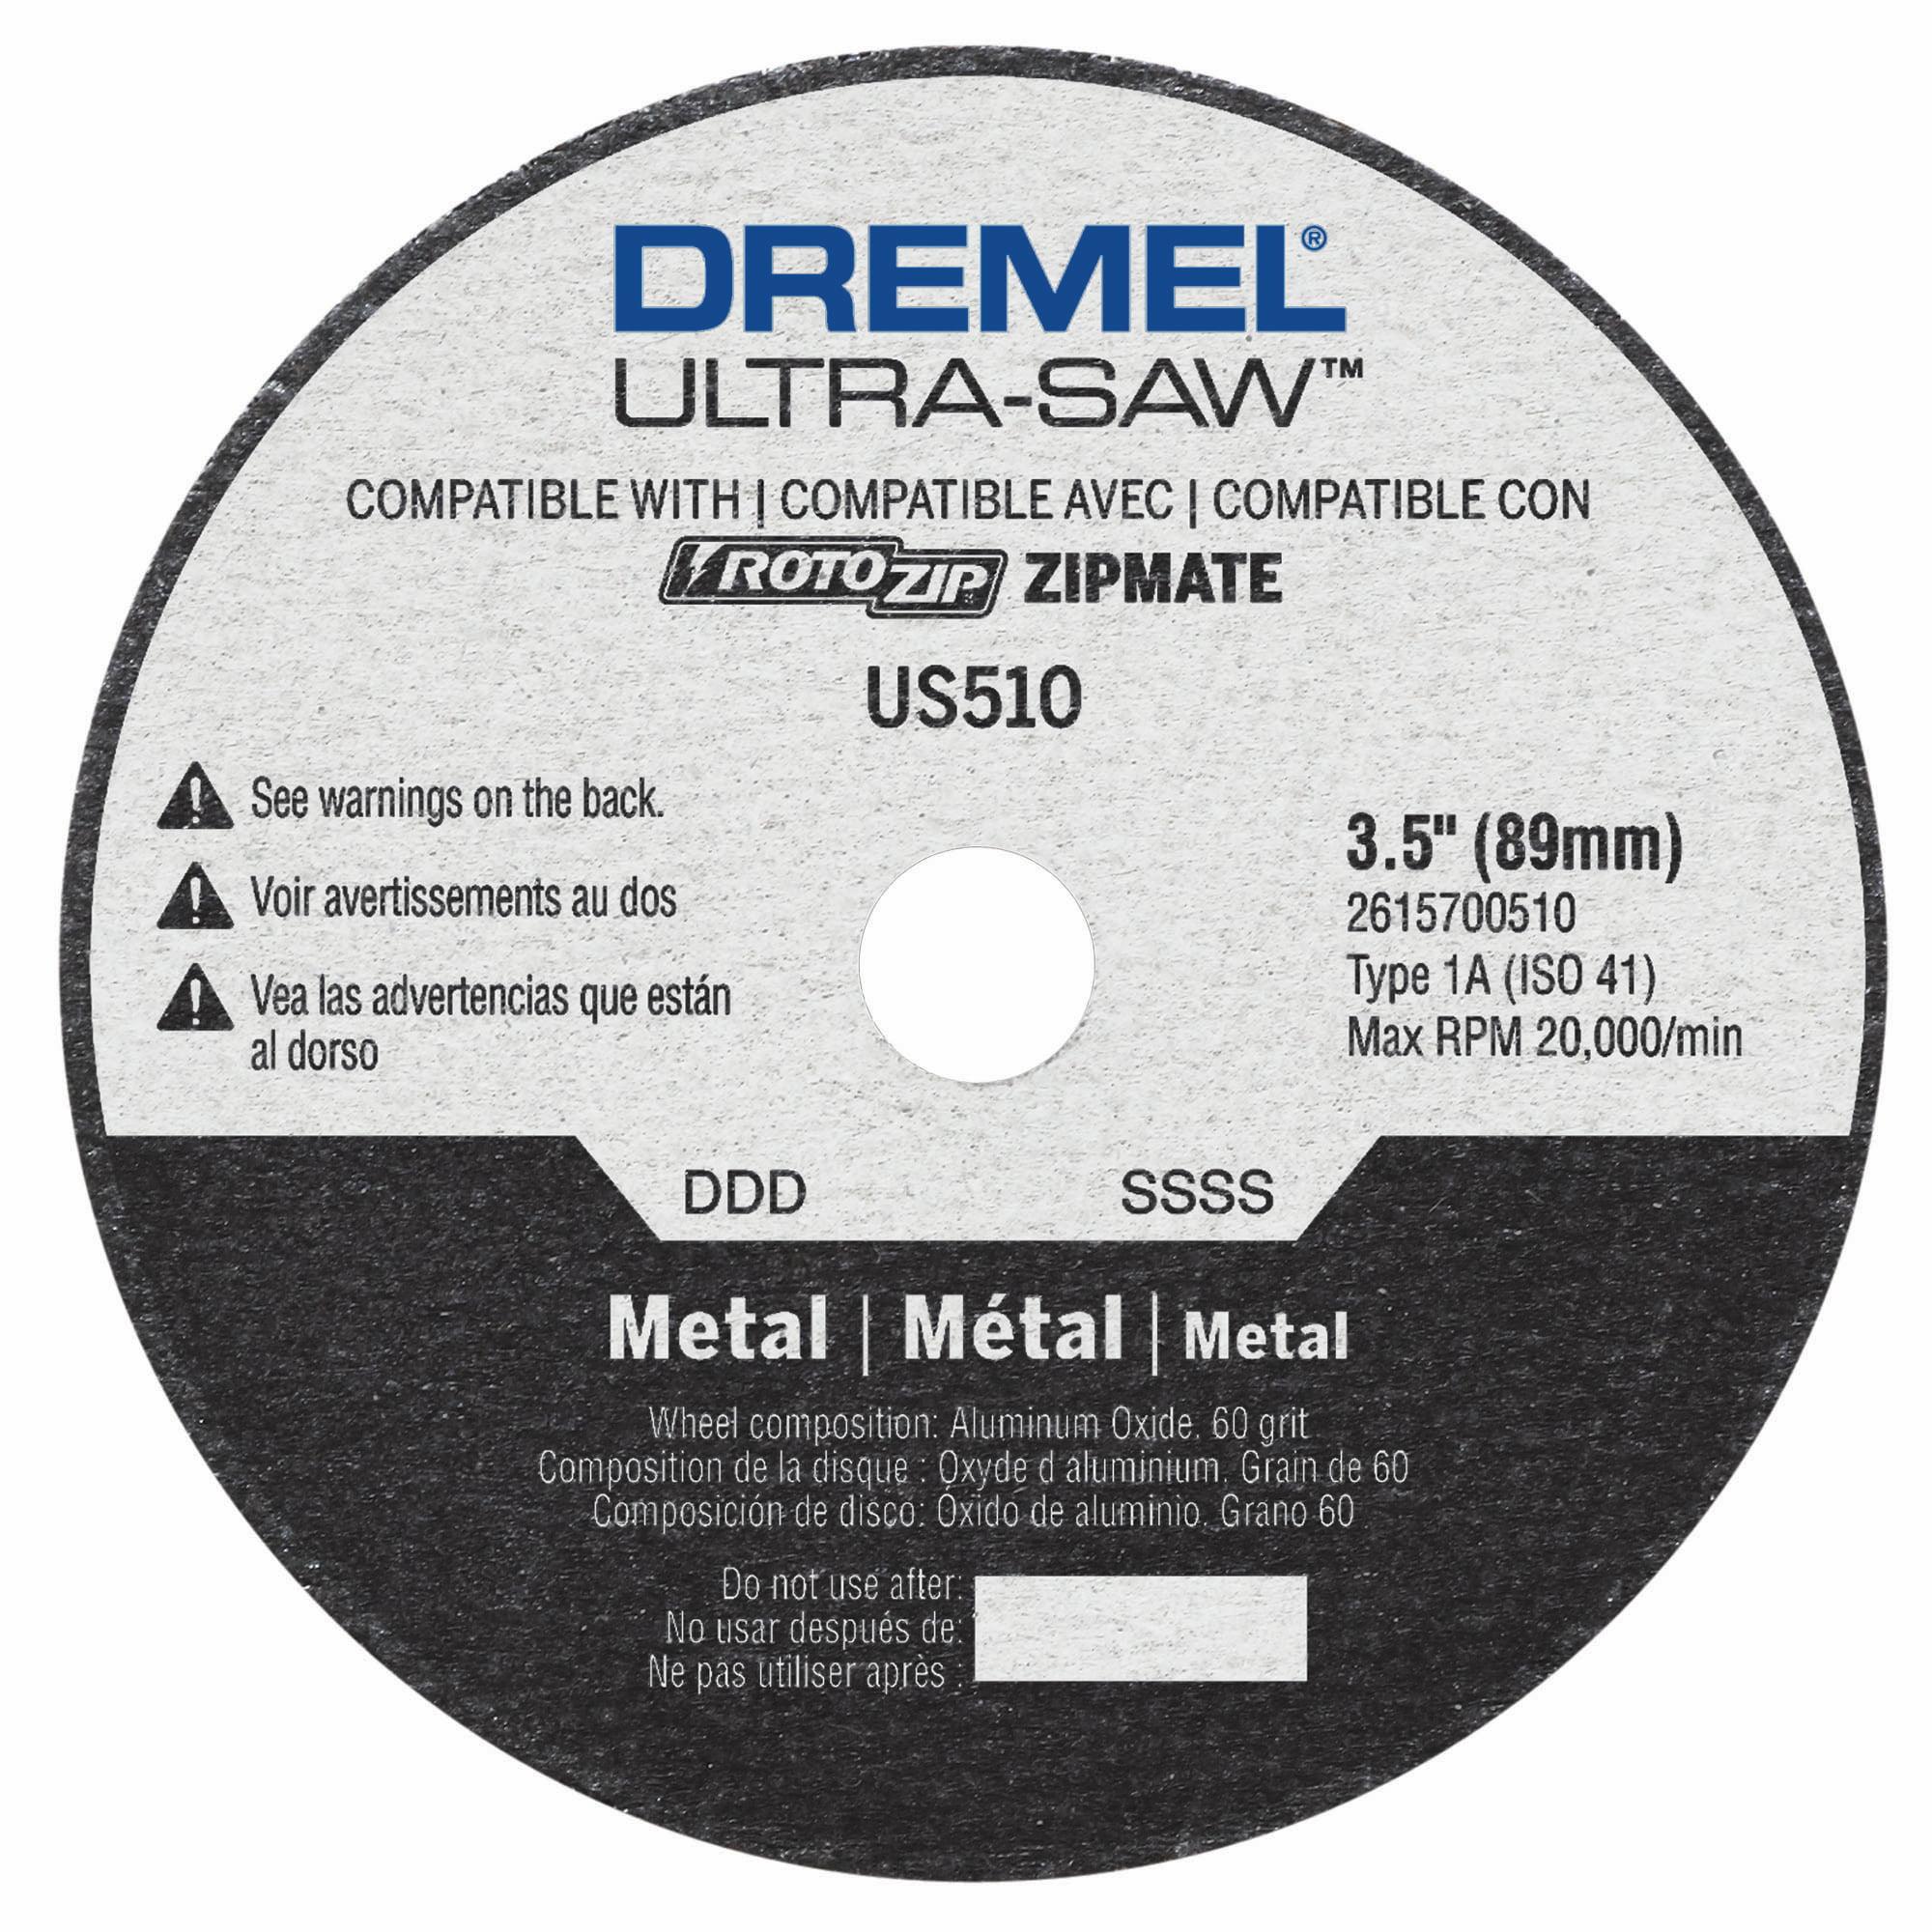 Dremel US510-01 3.5 In. Metal Cutting Wheel